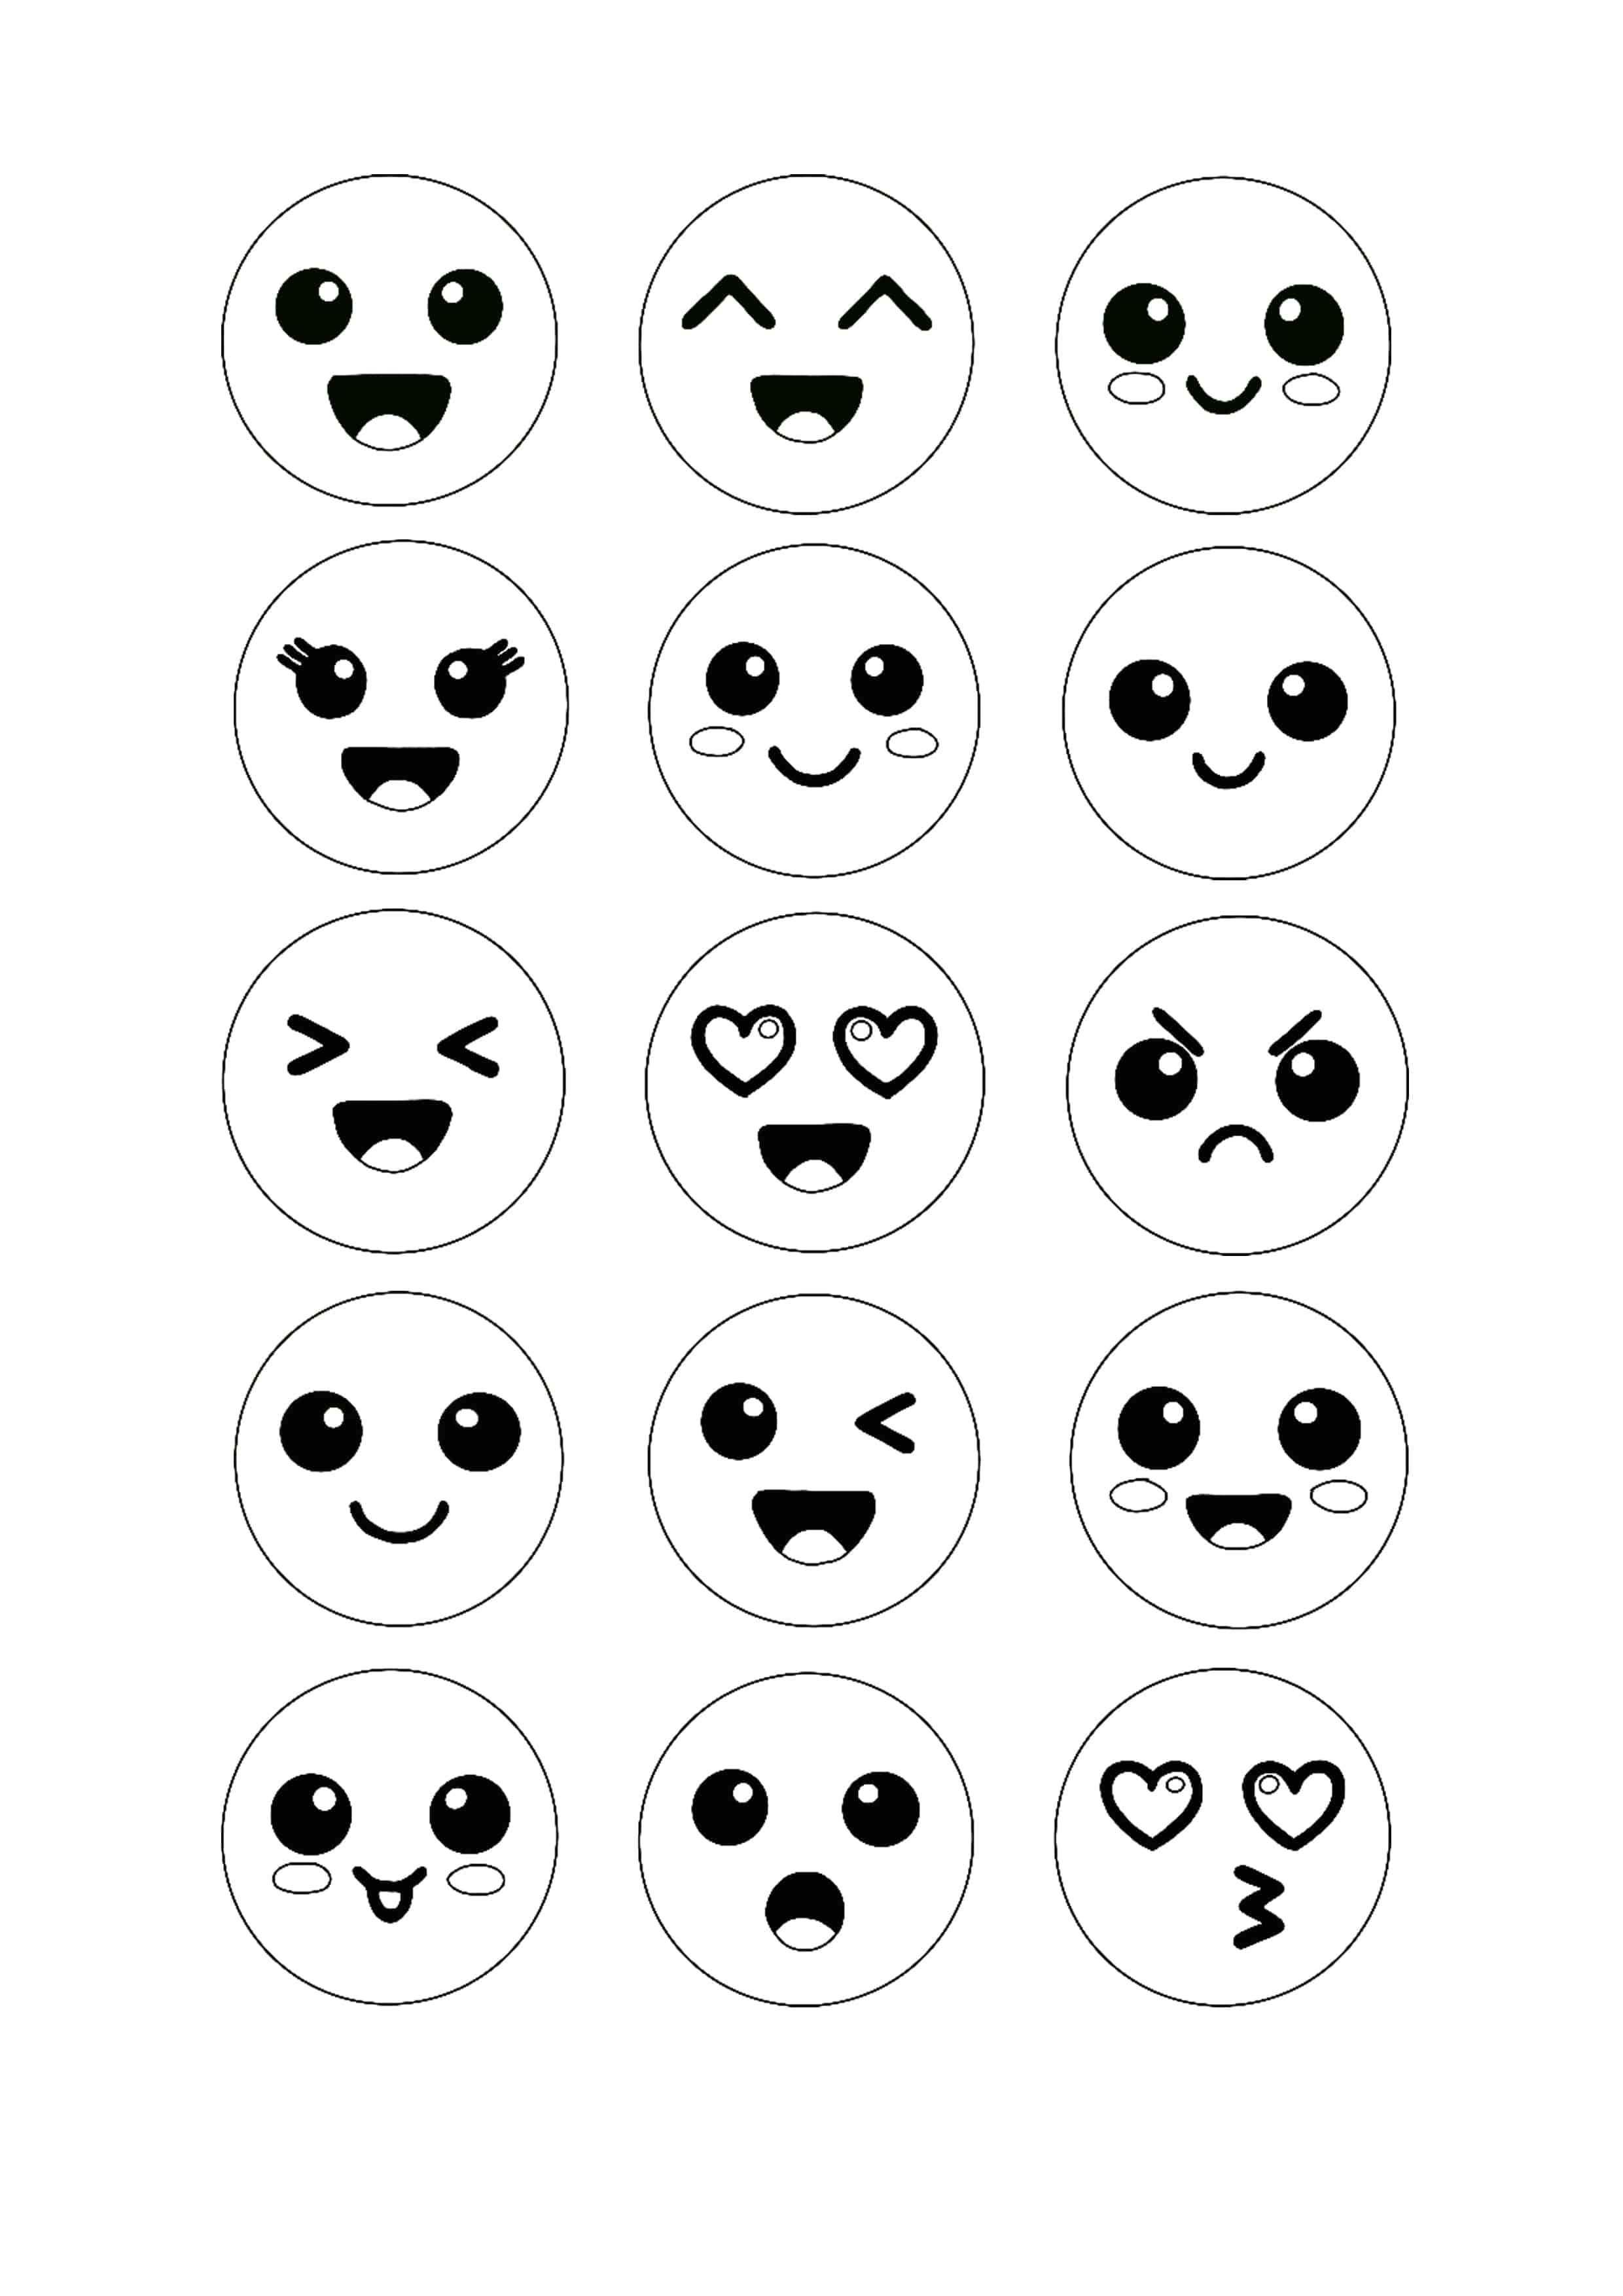 Kawaii Emoji Coloring Page Emoji Coloring Pages Free Printable Coloring Sheets Coloring Pages